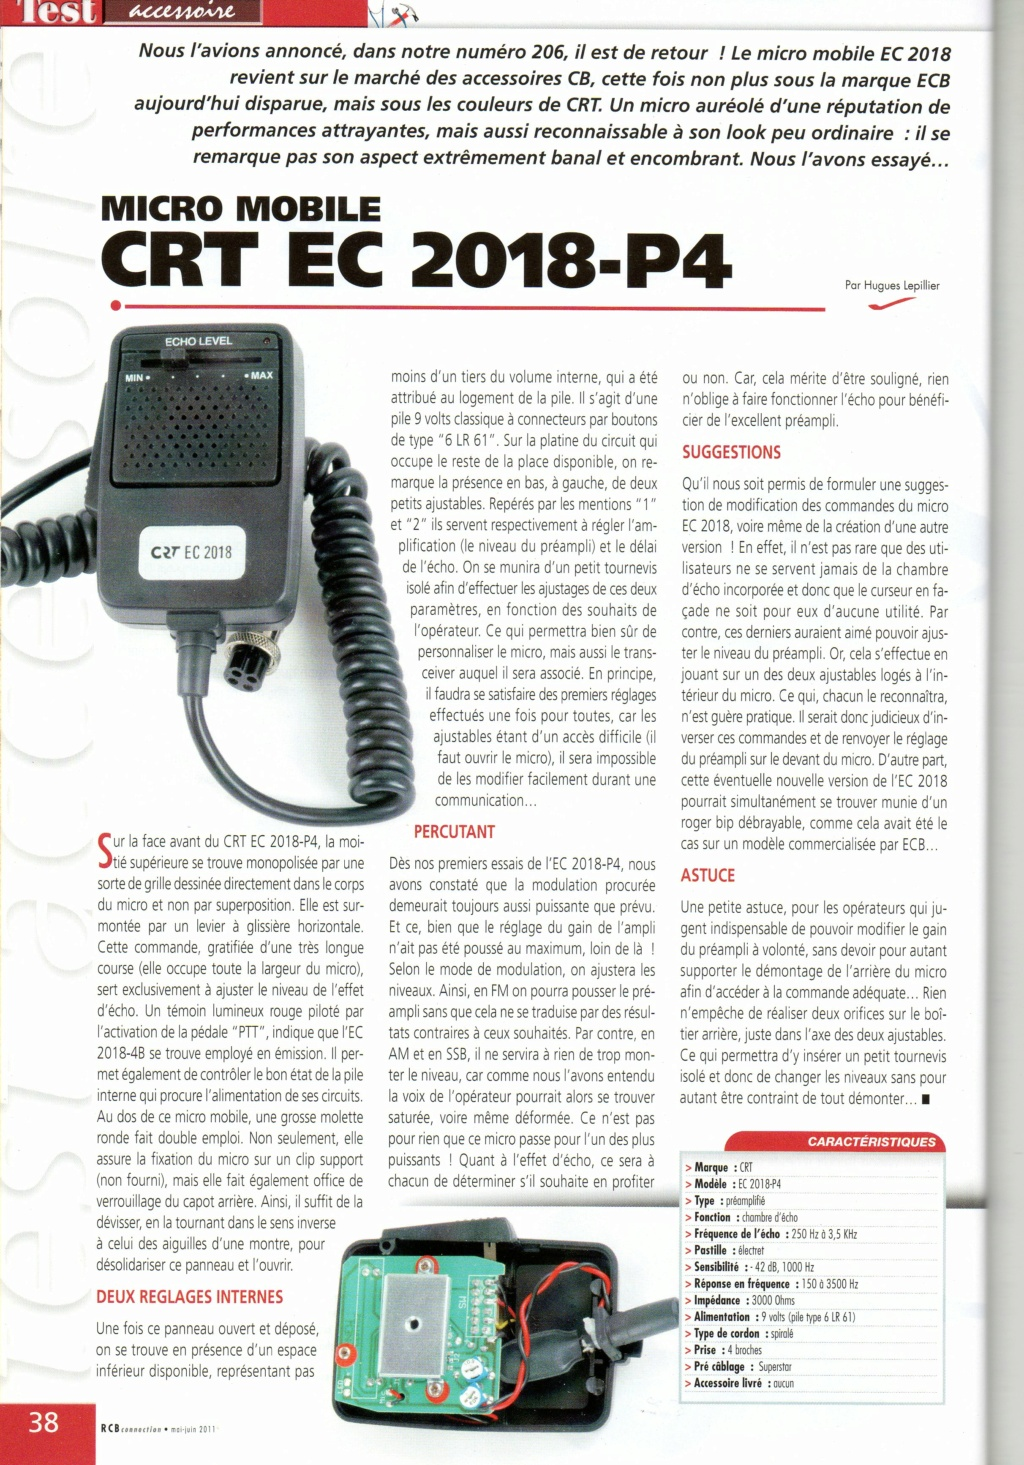 Micros - KM-2018 P4 & CRT EC-2018 P6 (ou P4 (Micros mobile) Chora585